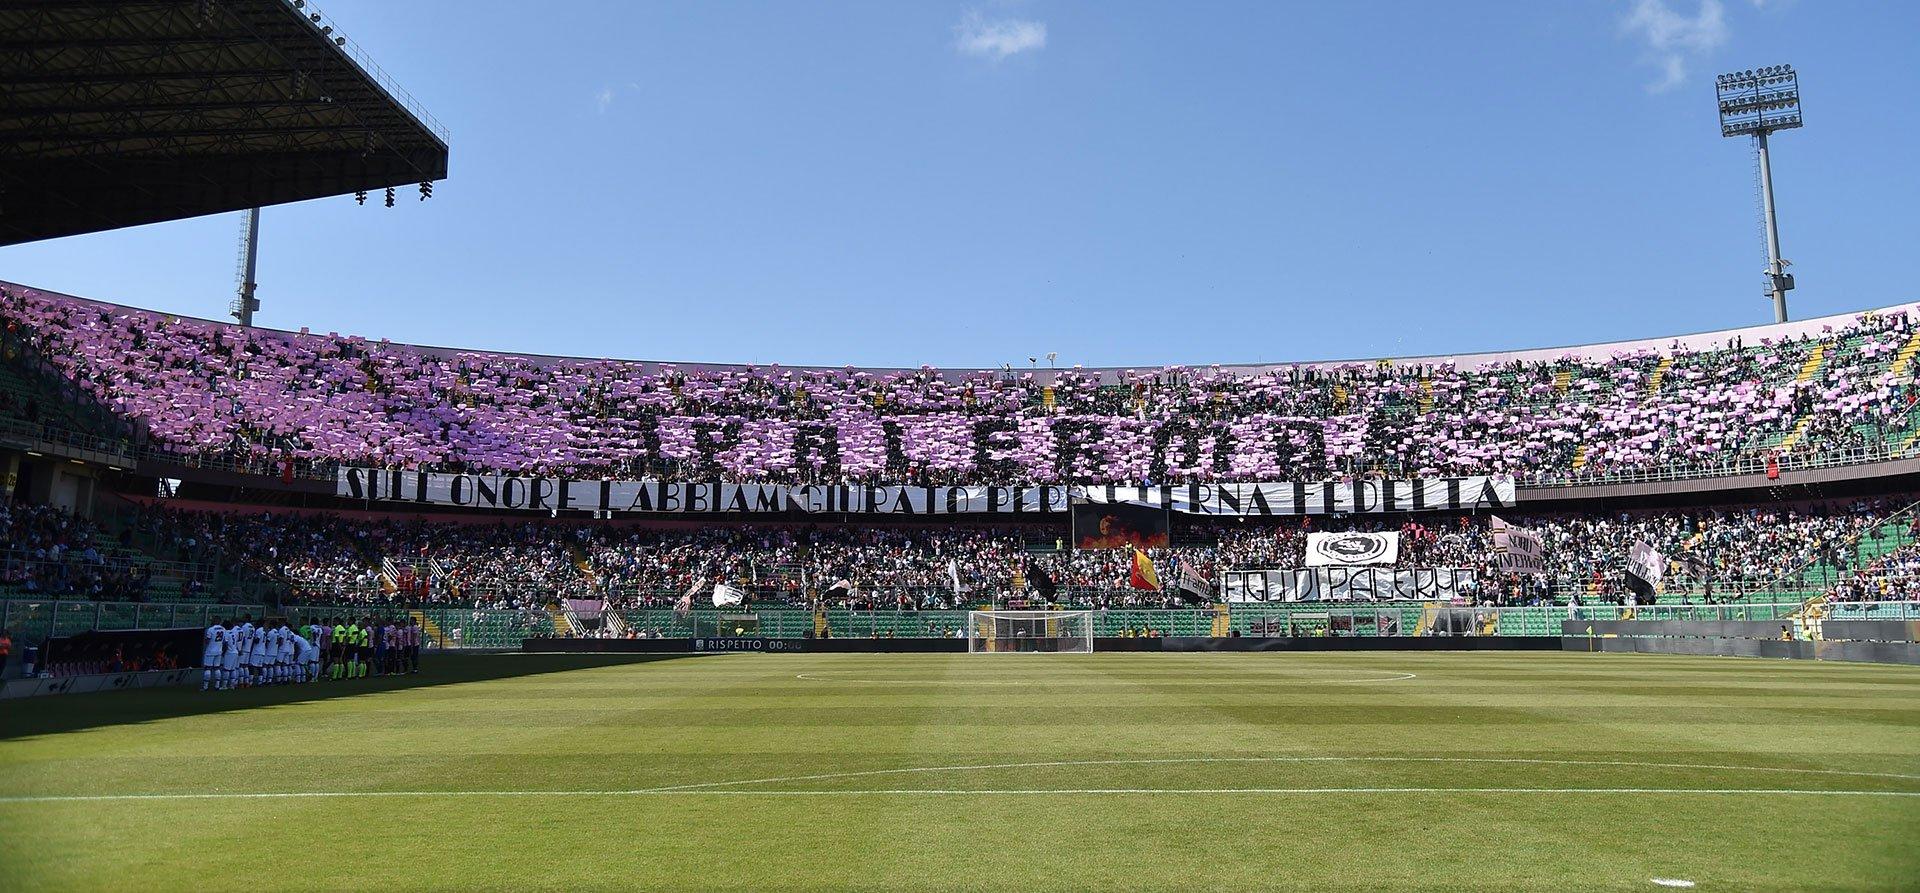 Palermo Calcio nel caos, sindaco valuta rinnovo concessione stadio